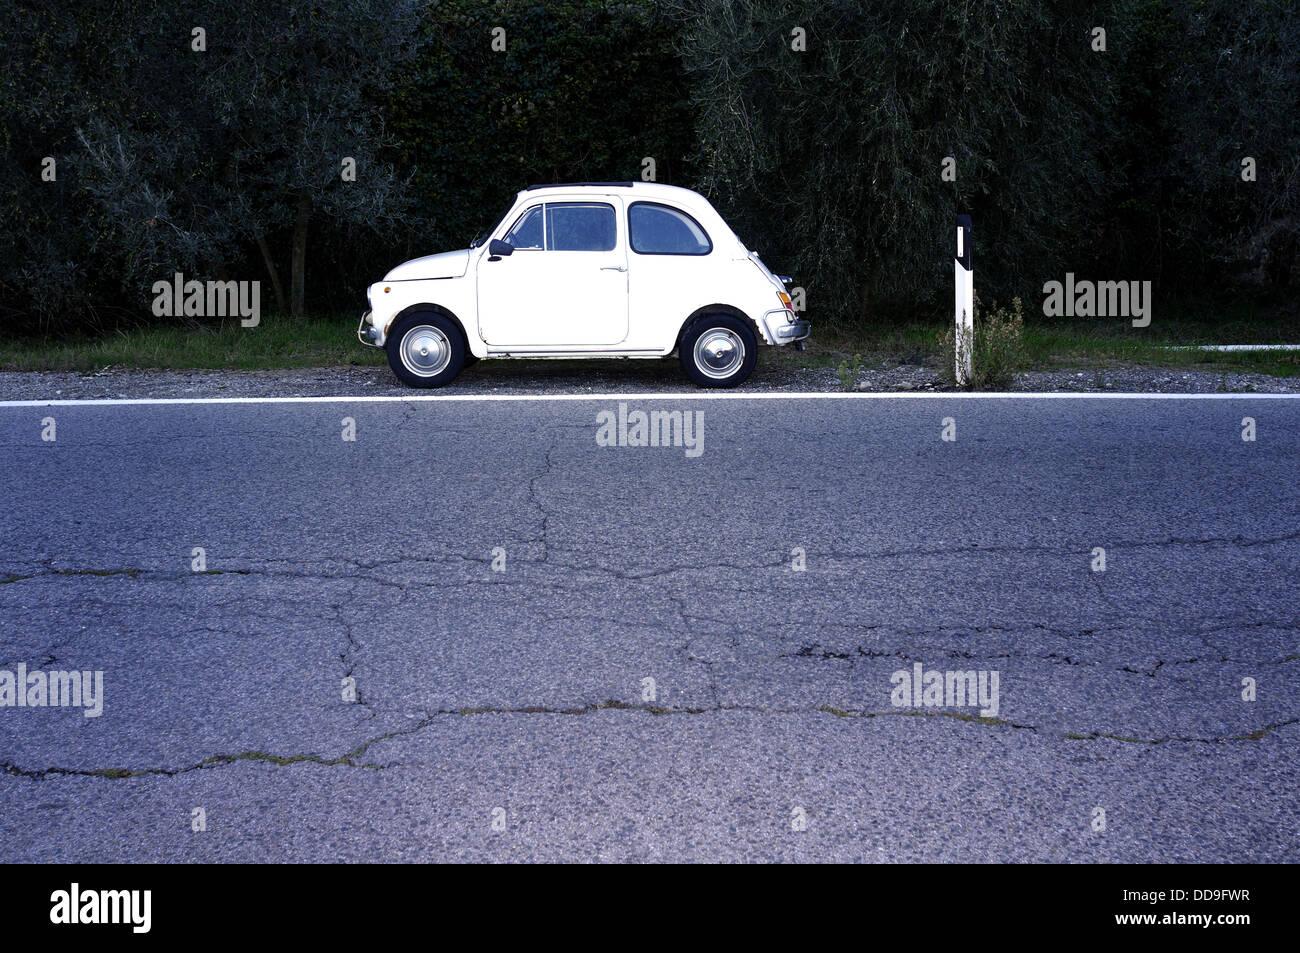 Old italian car 500 FIAT on a desert road - Stock Image